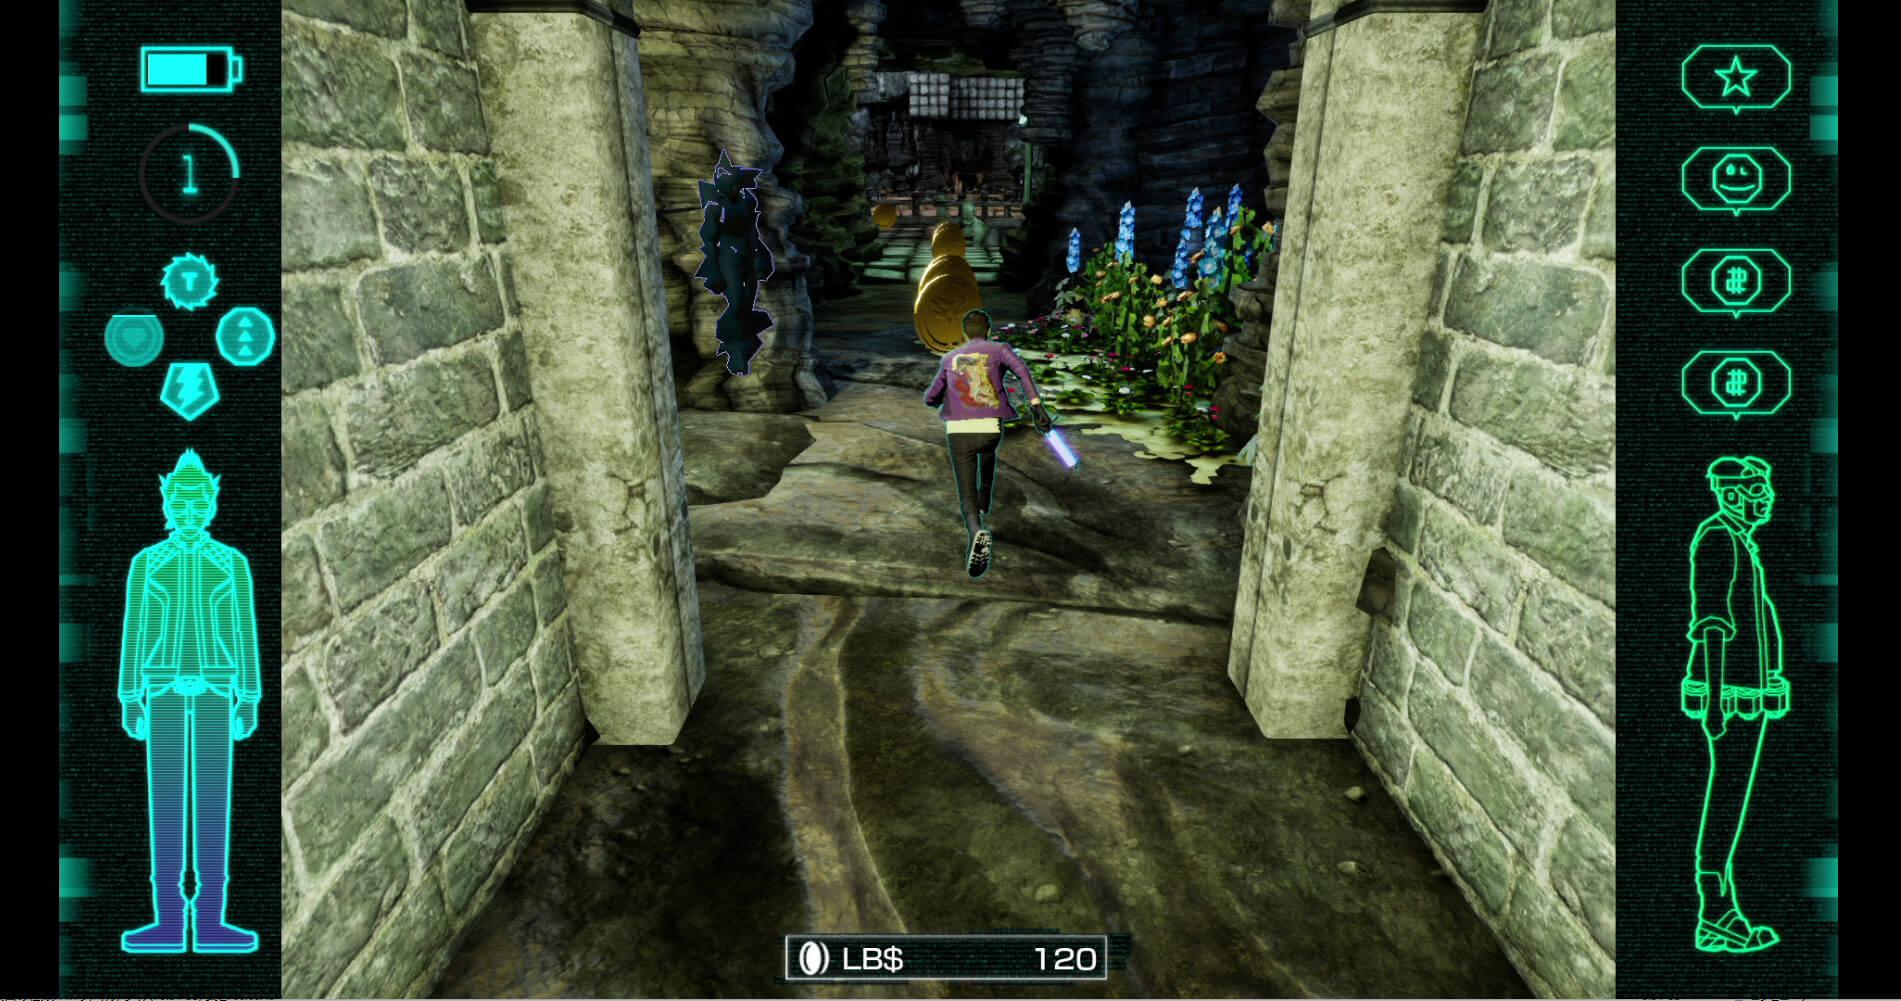 Скриншот из игры Travis Strikes Again: No More Heroes Complete Edition